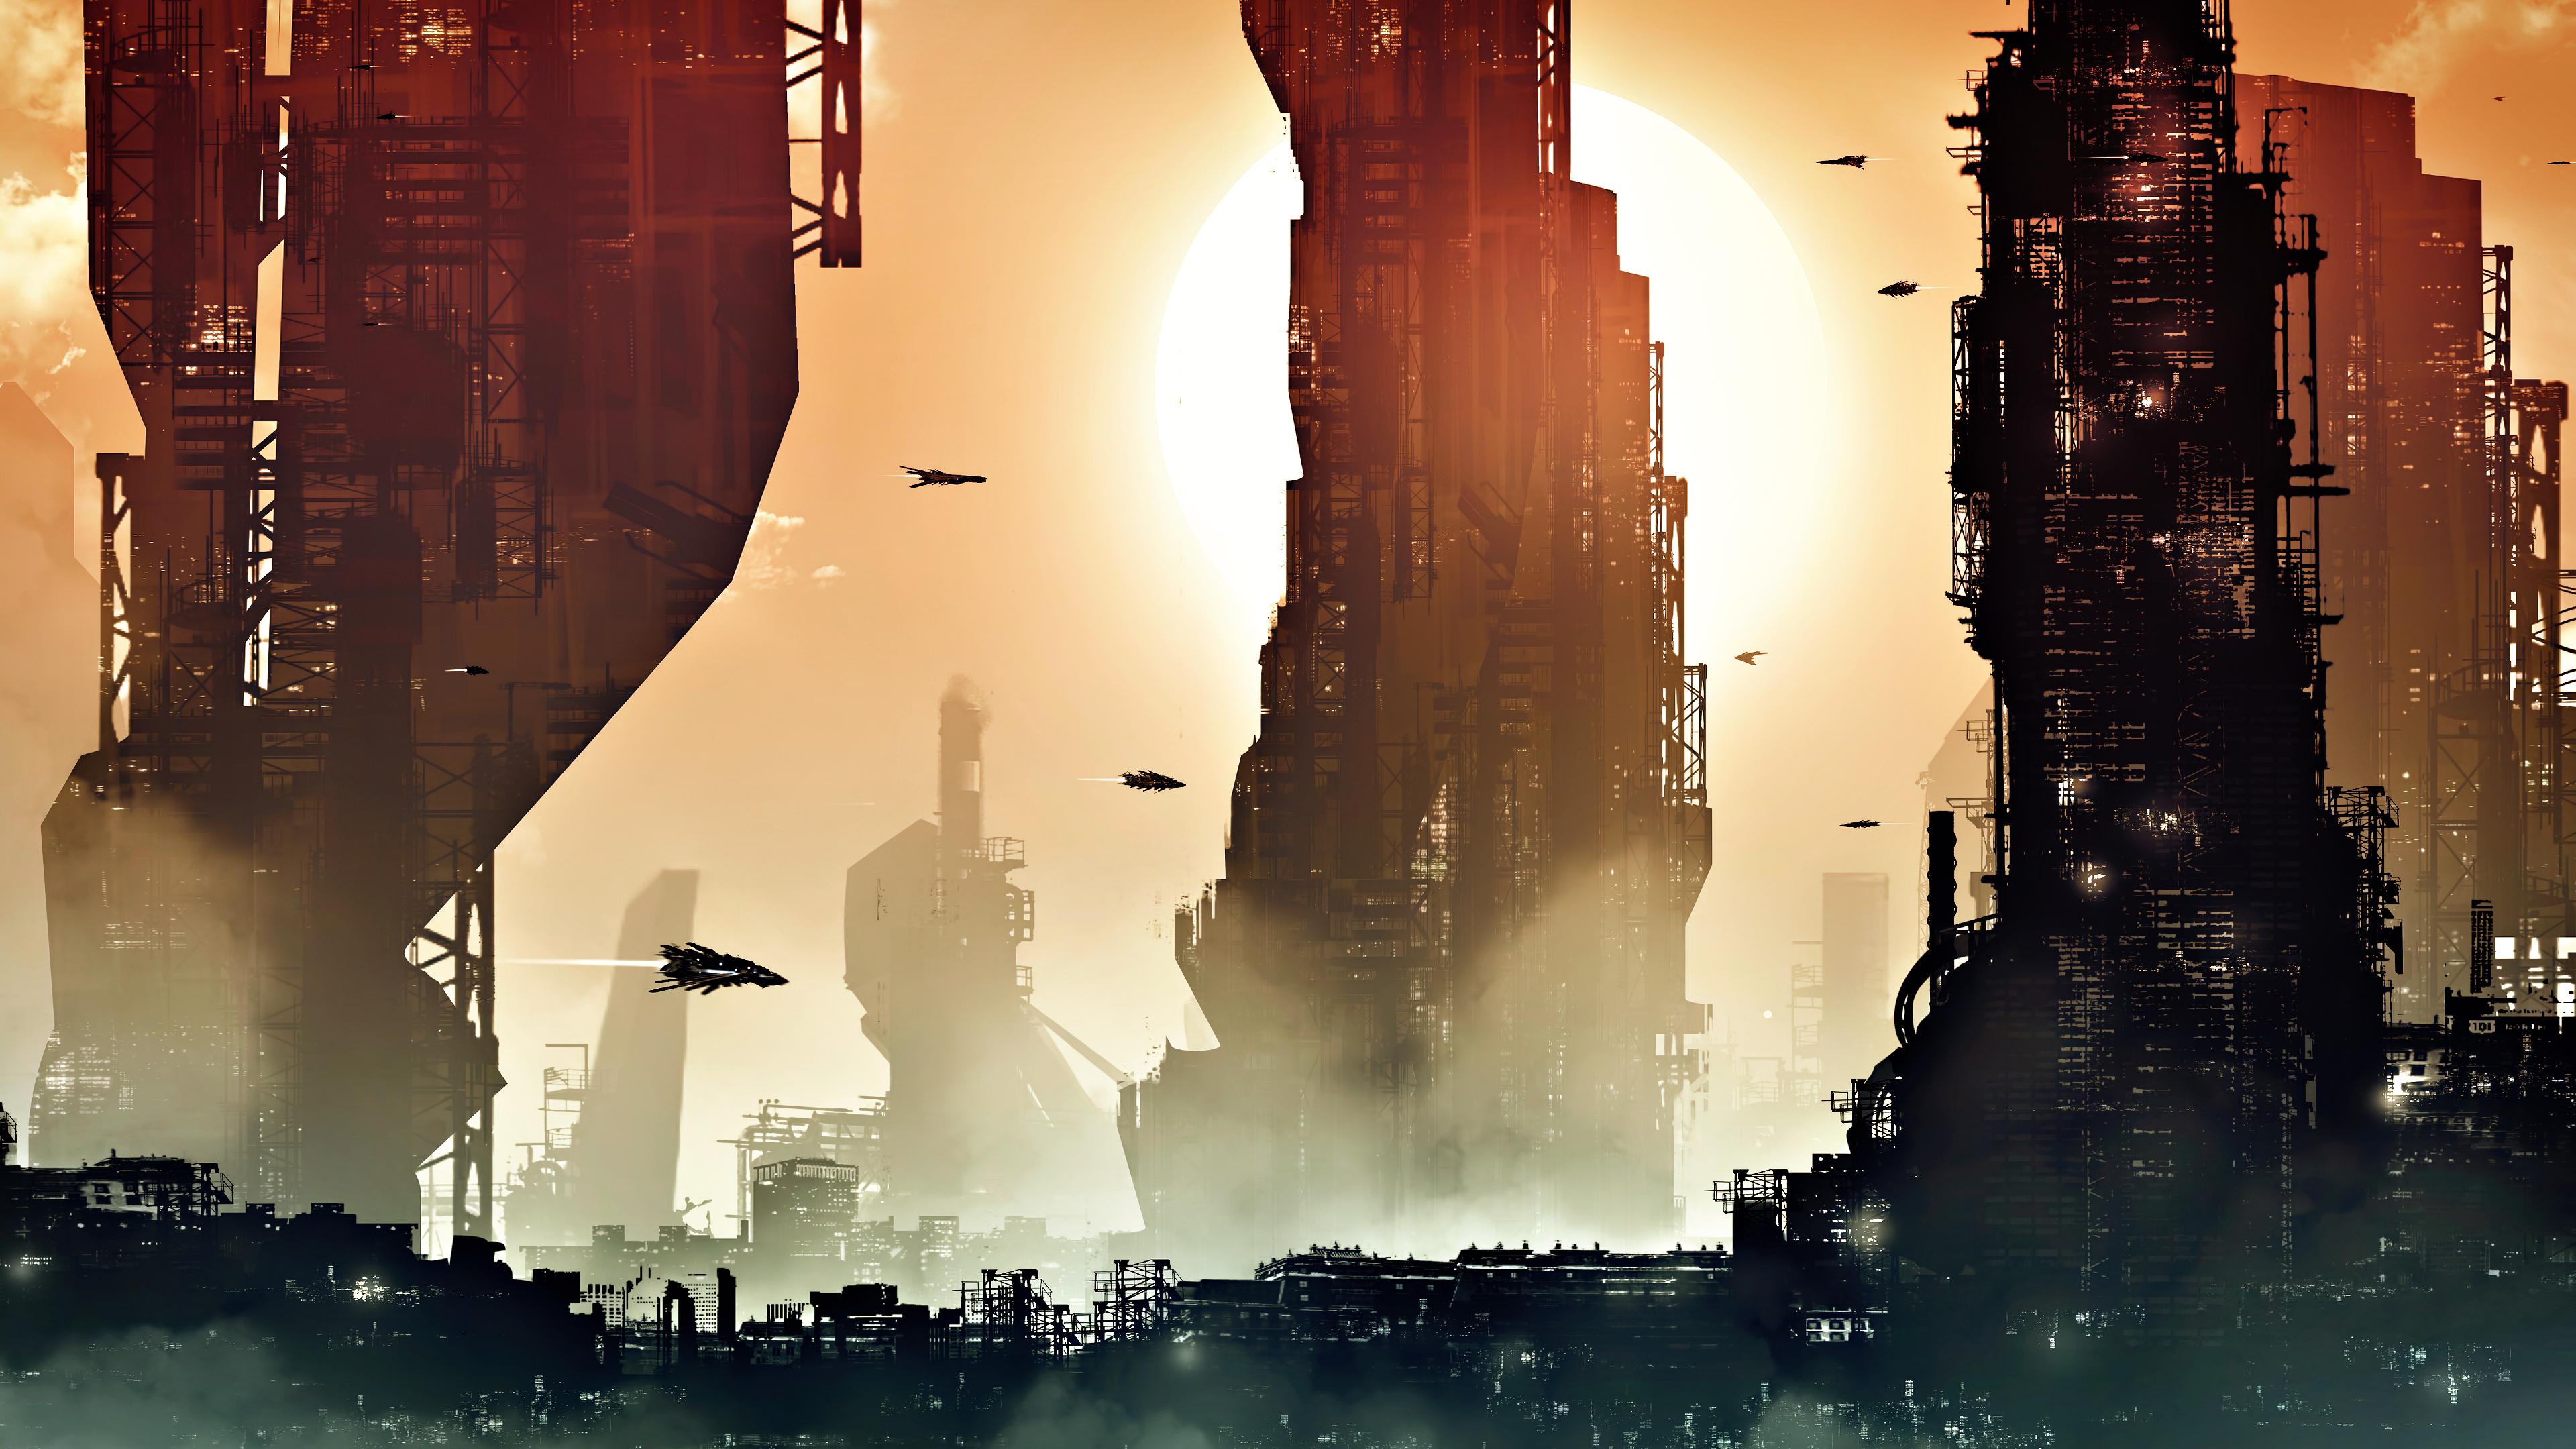 General 3840x2160 futuristic science fiction digital art artwork fantasy art fan art 3D CGI cyberpunk cyber realistic city urban cityscape futuristic city